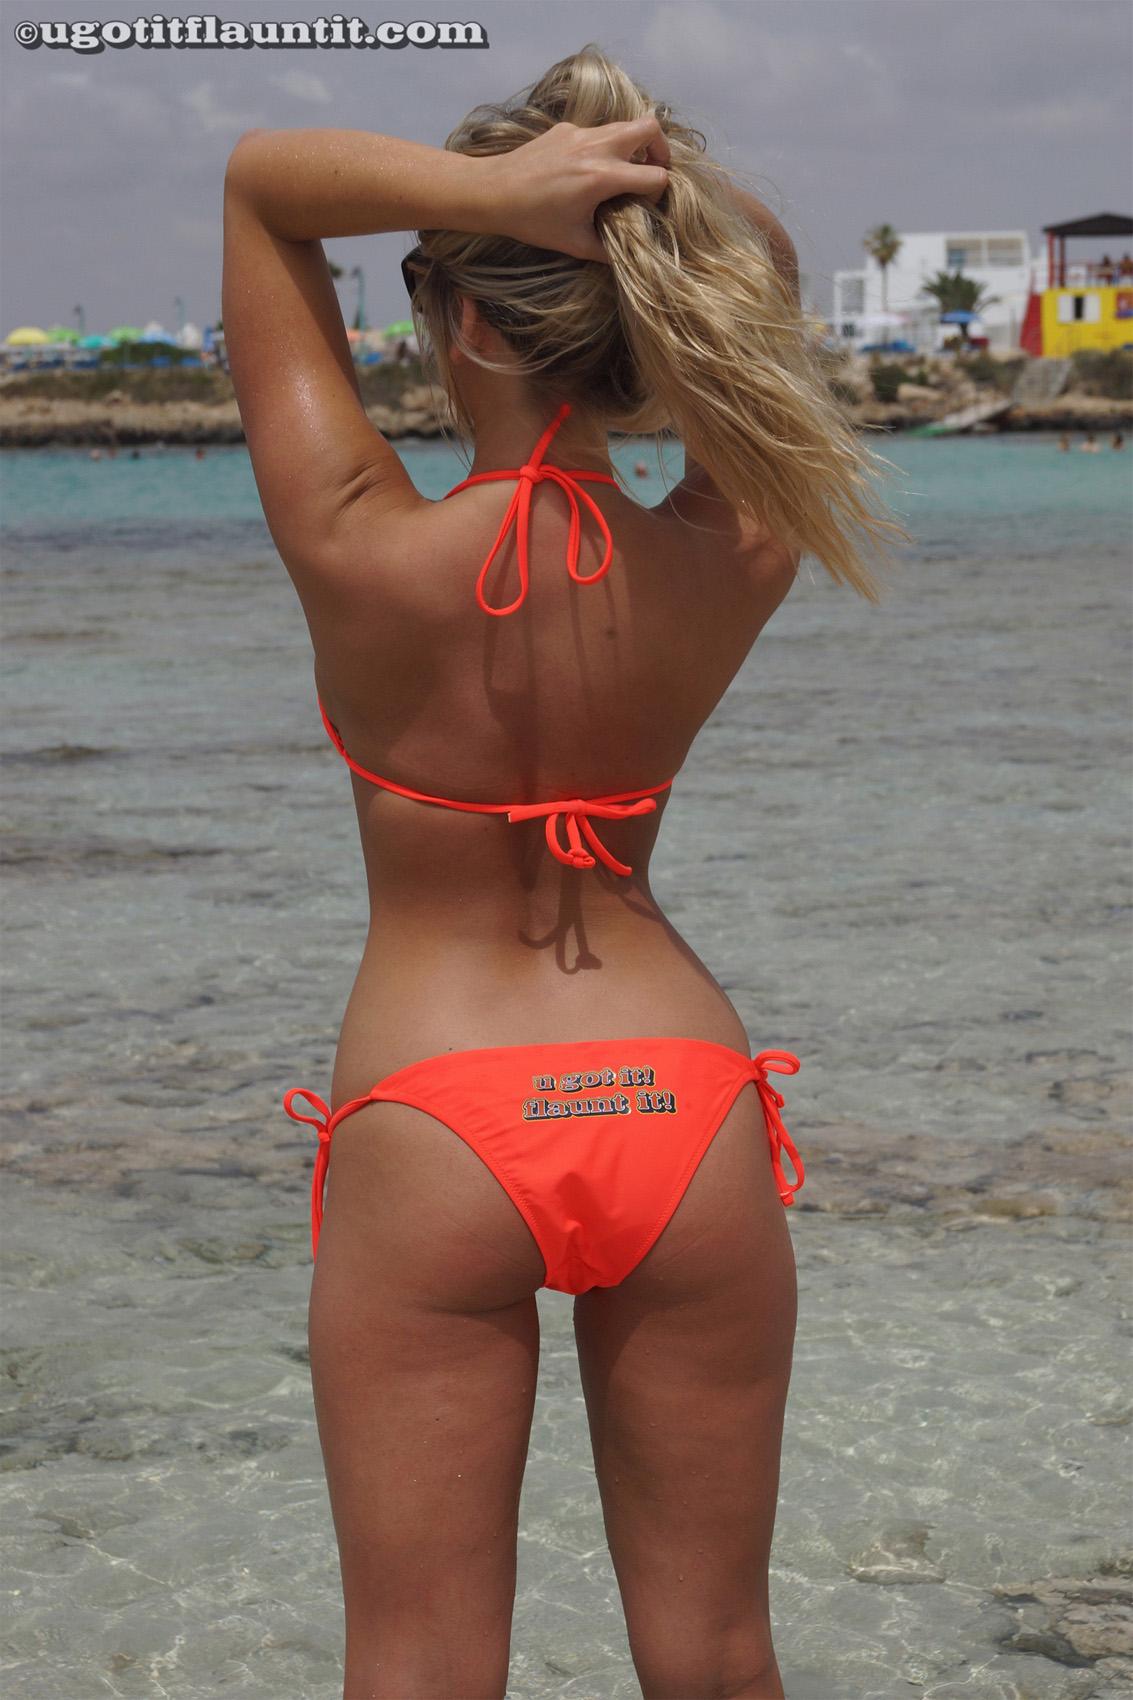 beach bikini tease